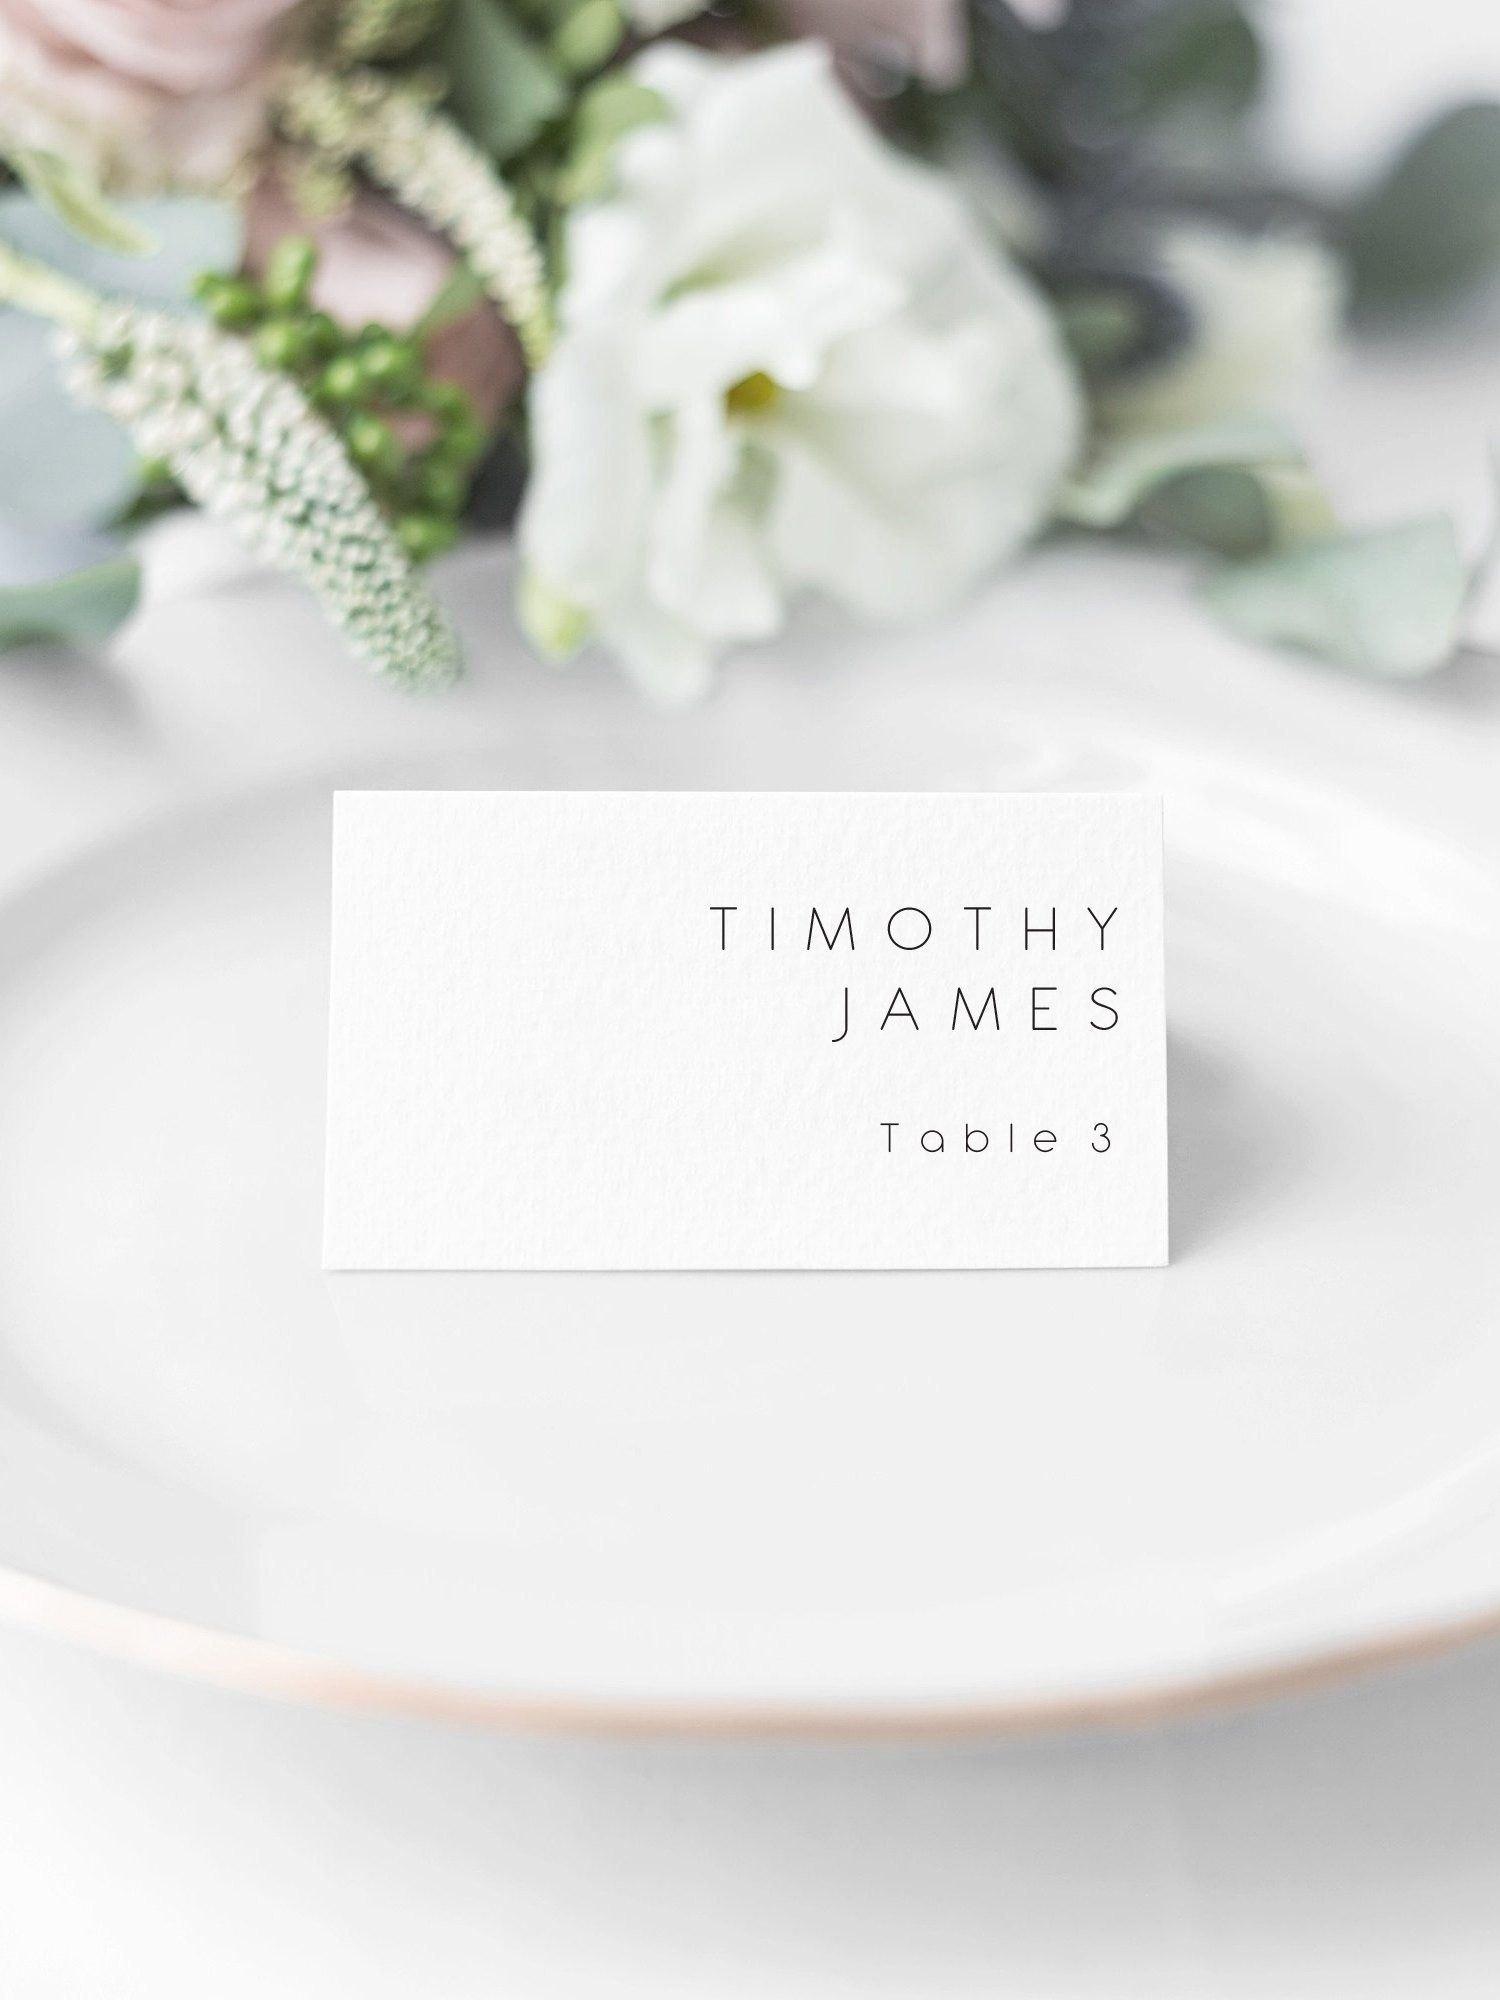 Wedding Place Cards Wedding Name Cards Editable Escort Cards With Printable Escort Cards Template